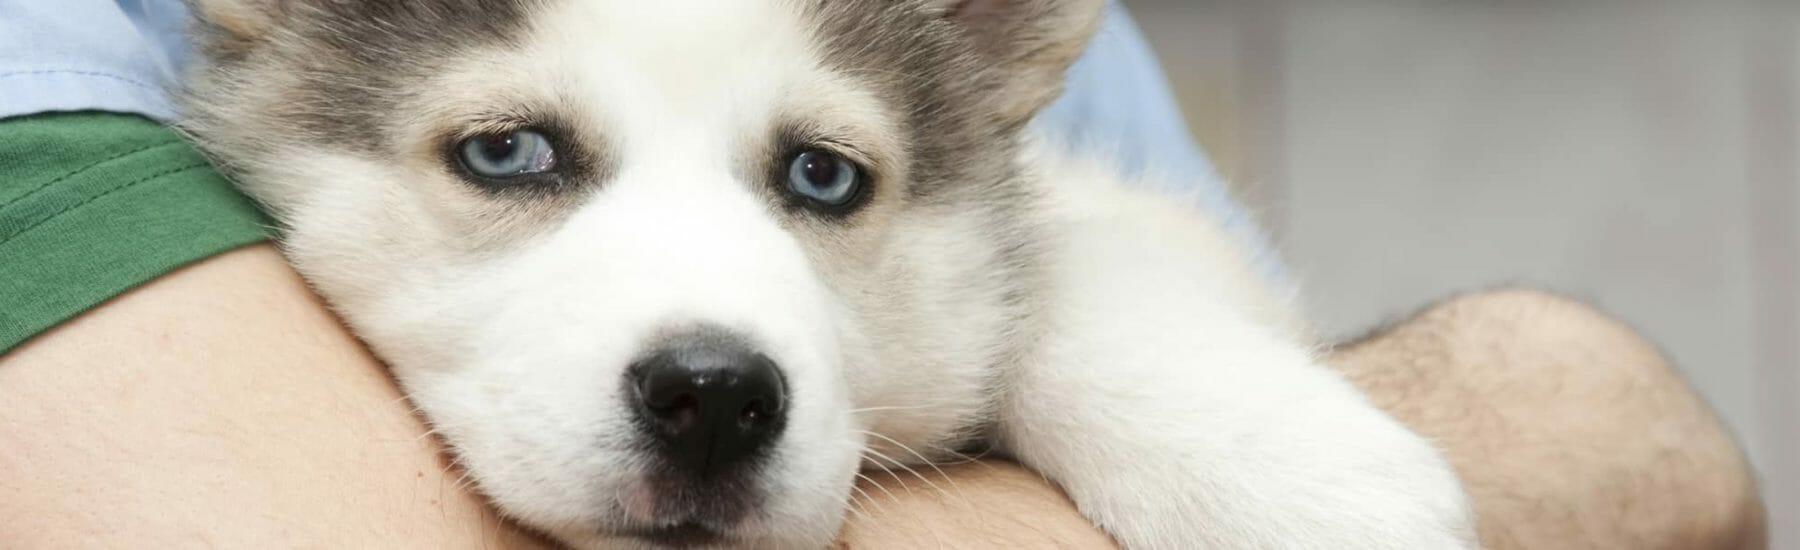 Small husky being held by veterinarian